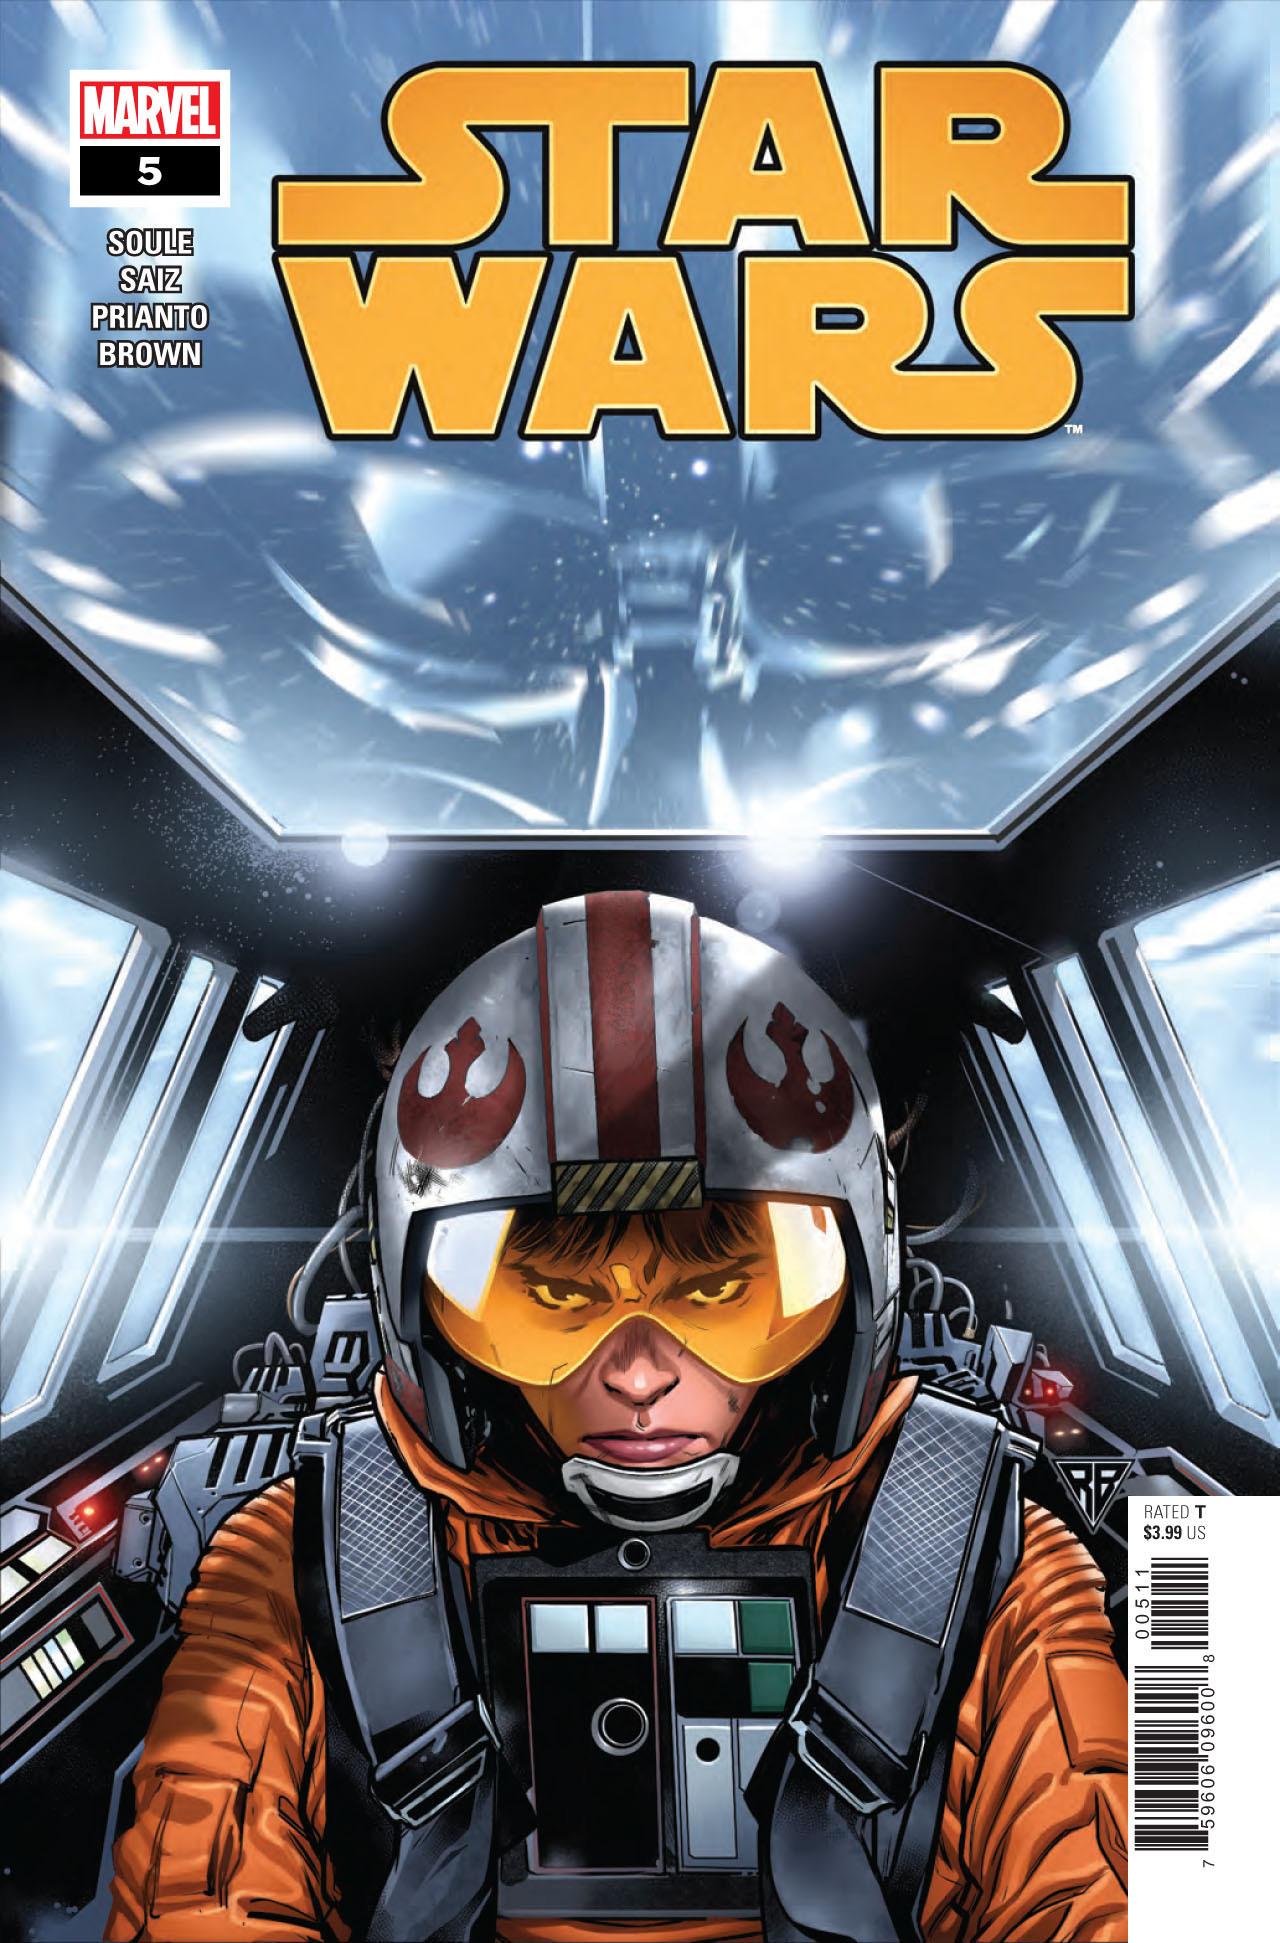 Star Wars #5 (05.08.2020)